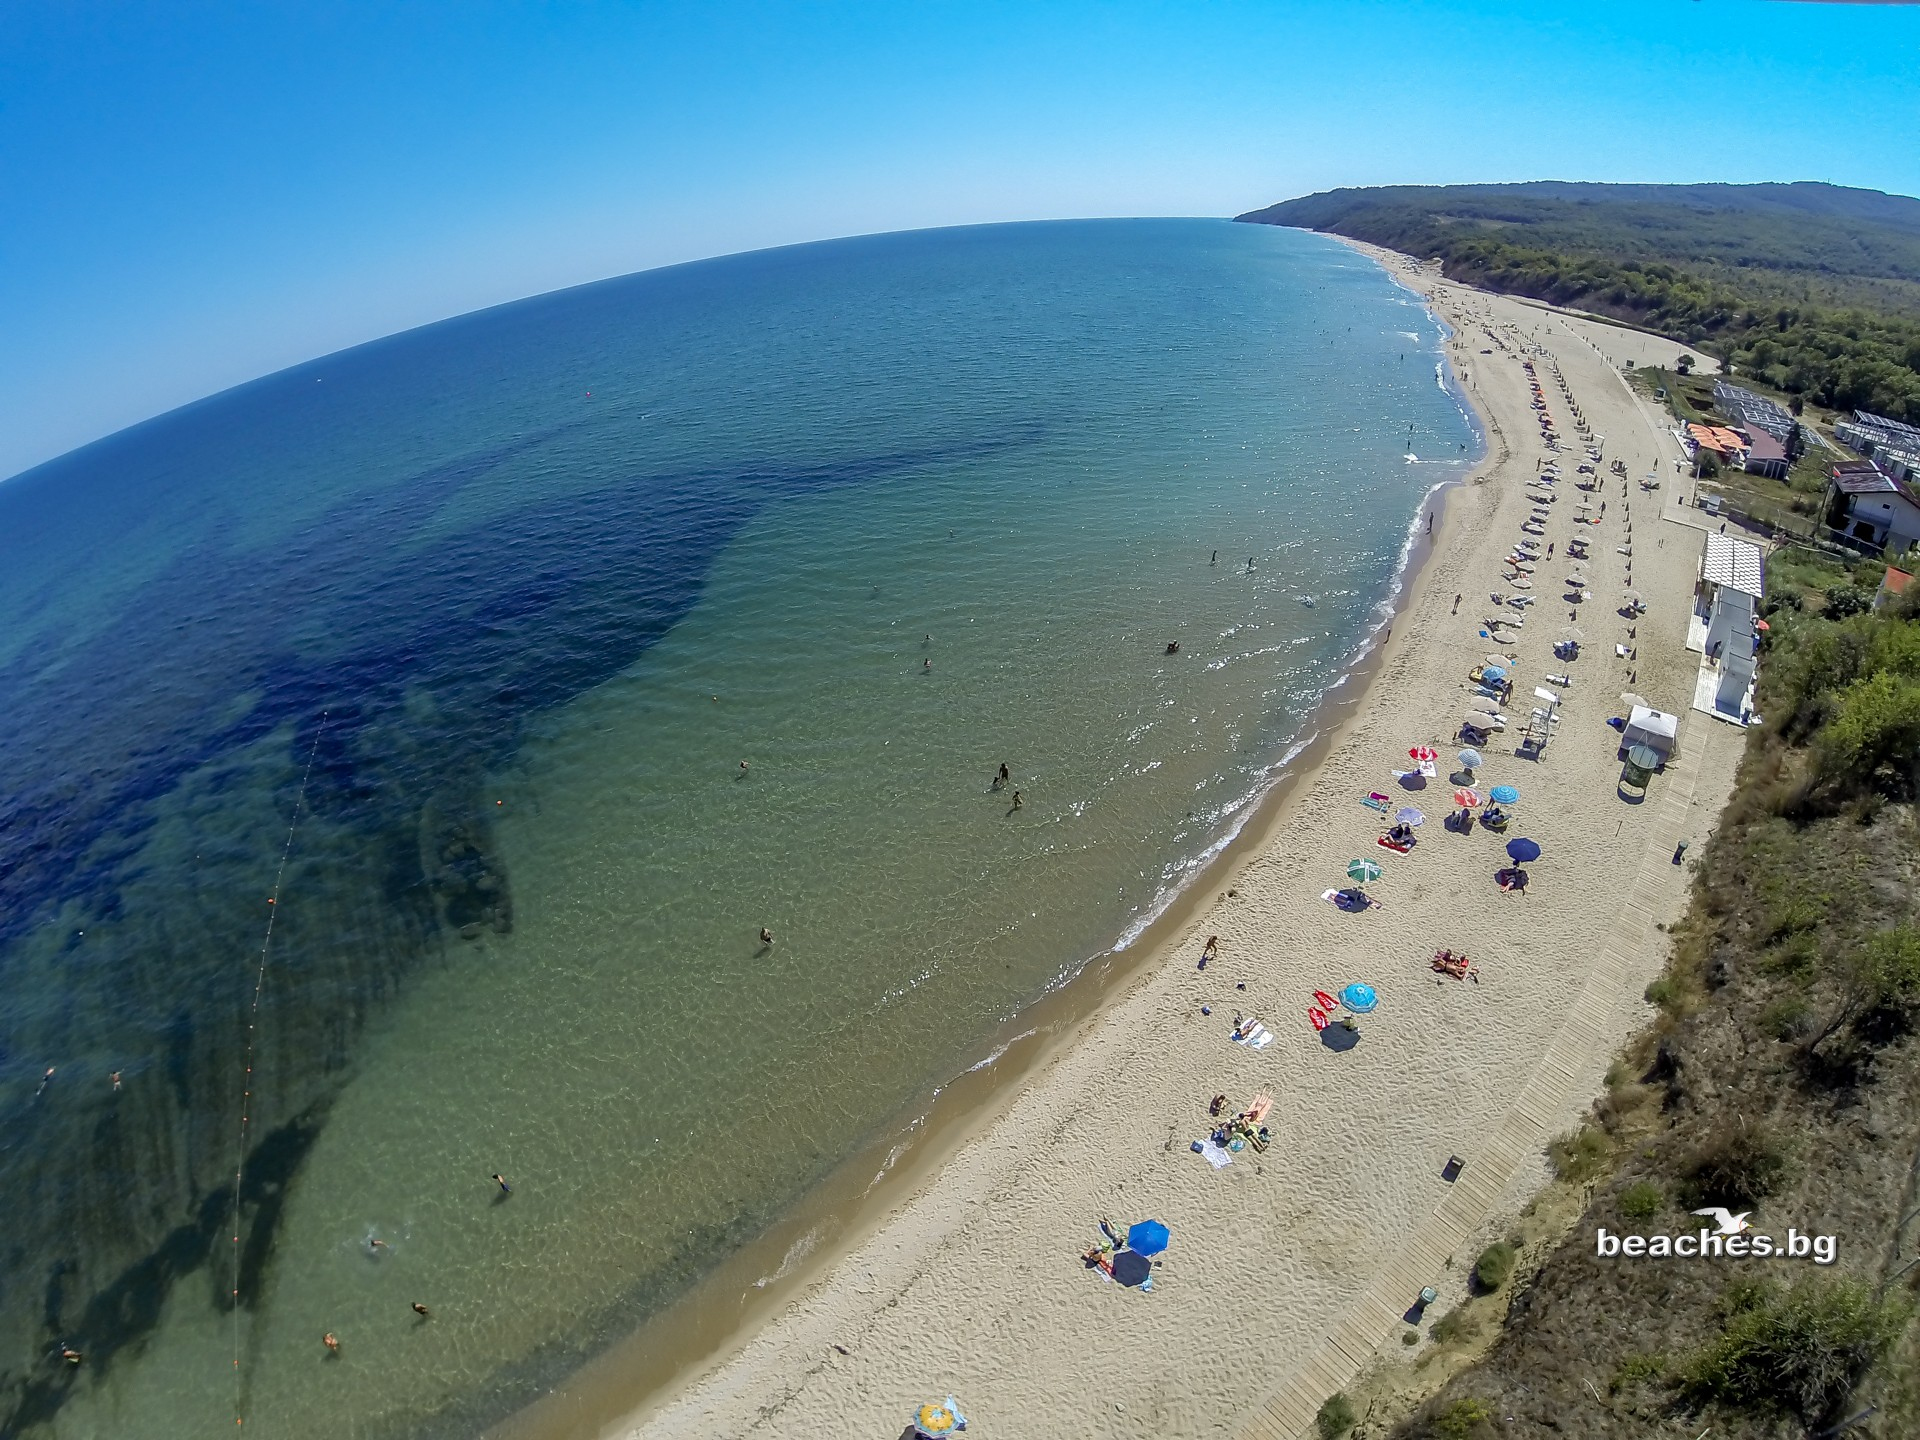 beaches.bg - Плаж Иракли, България